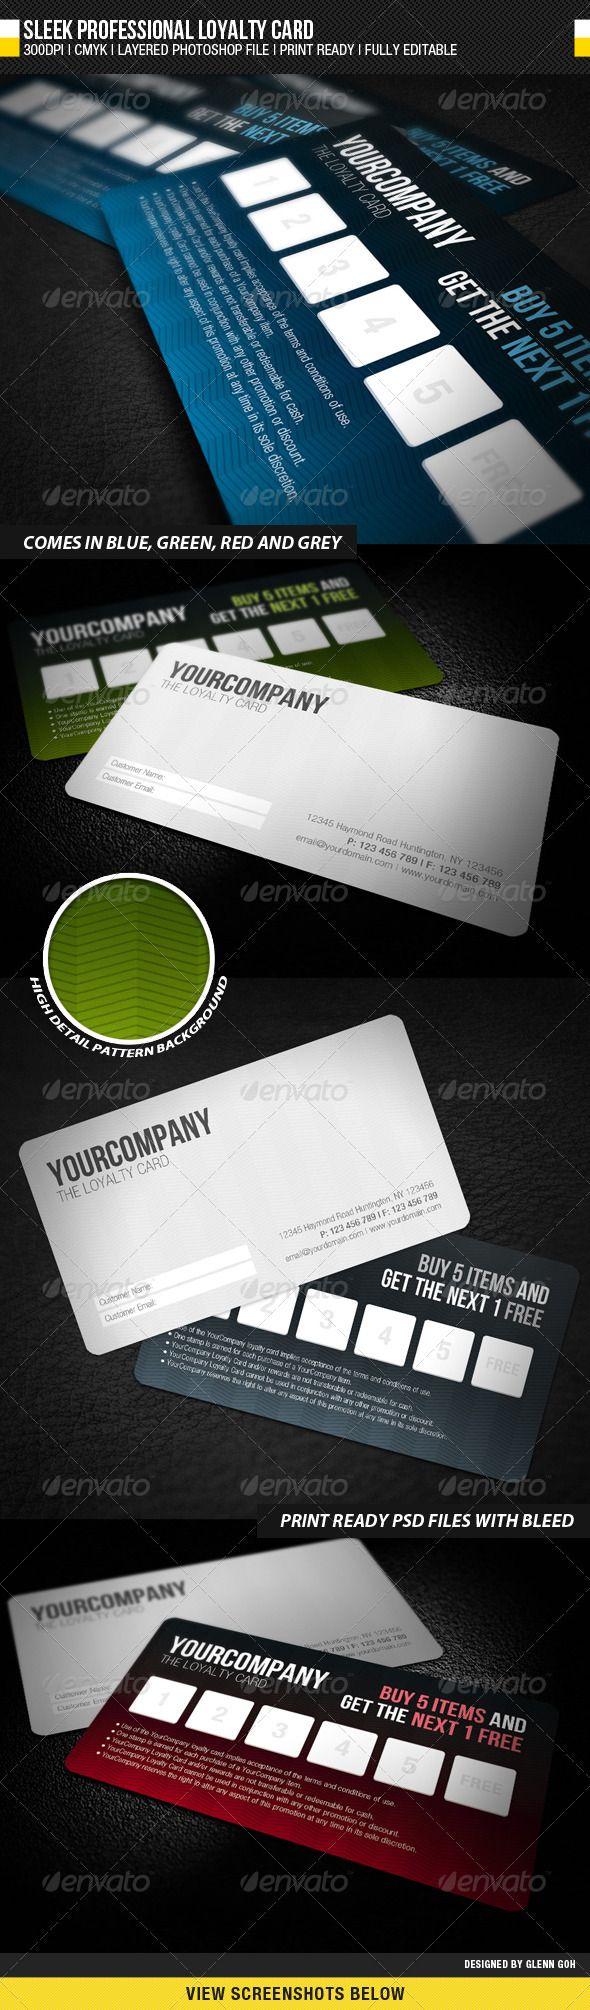 sleek professional loyalty card  loyalty card business